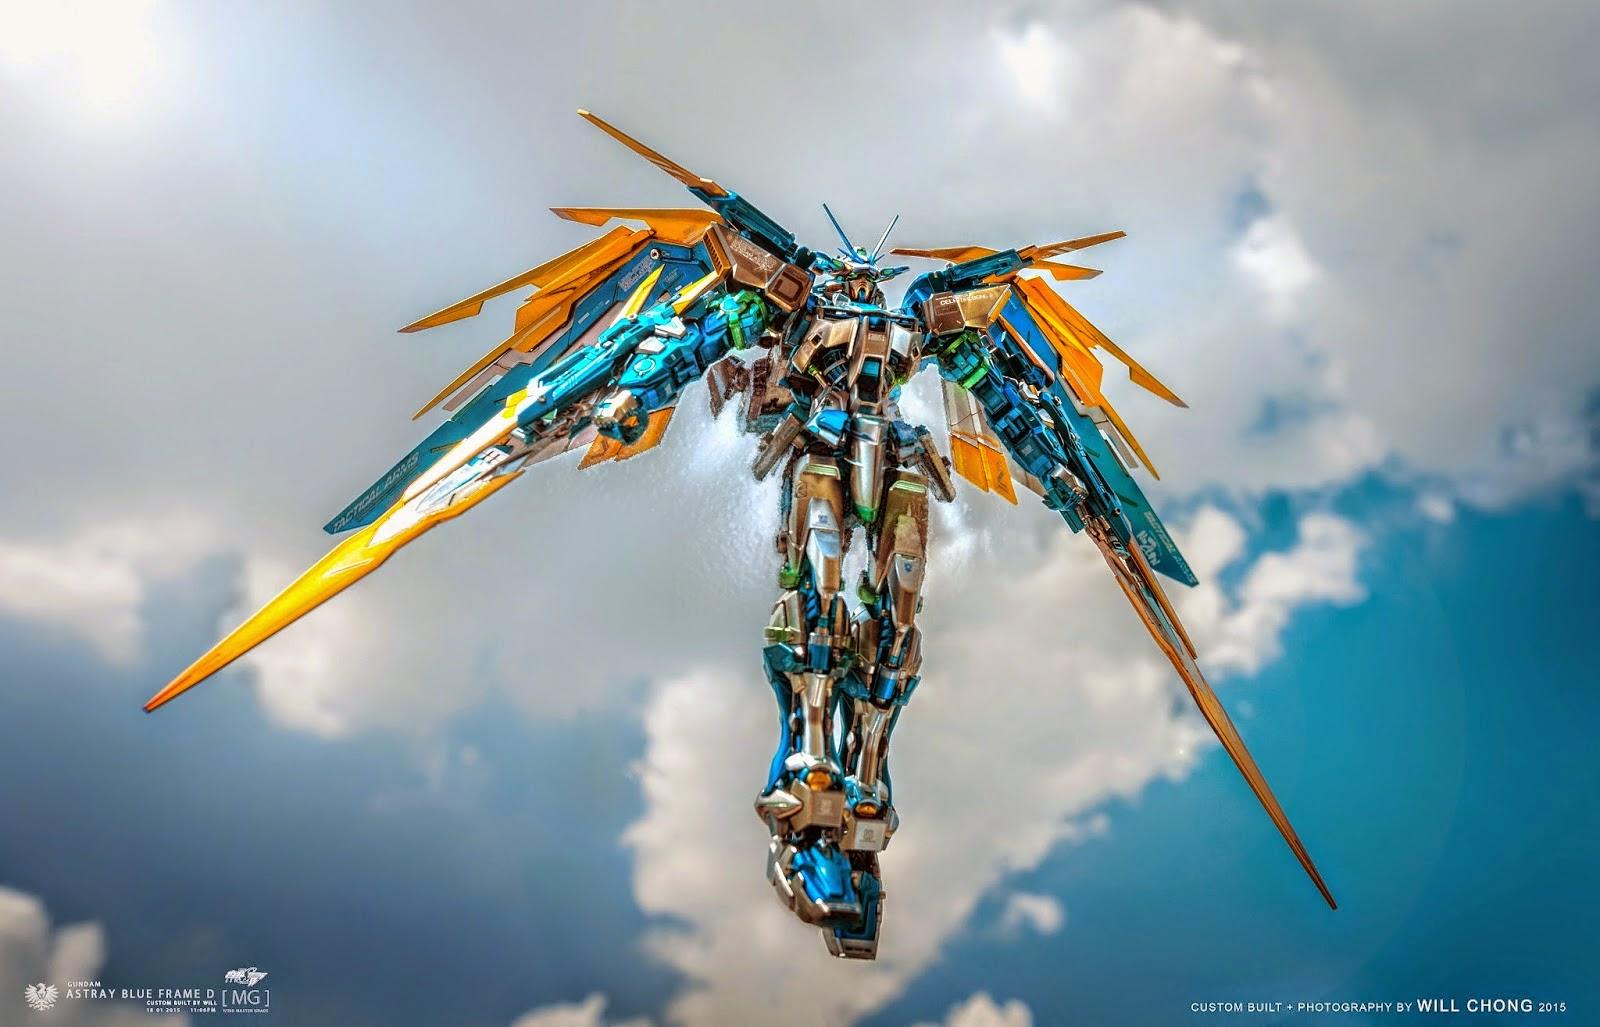 Custom Build Mg 1 100 Gundam Astray Blue Frame D Cold